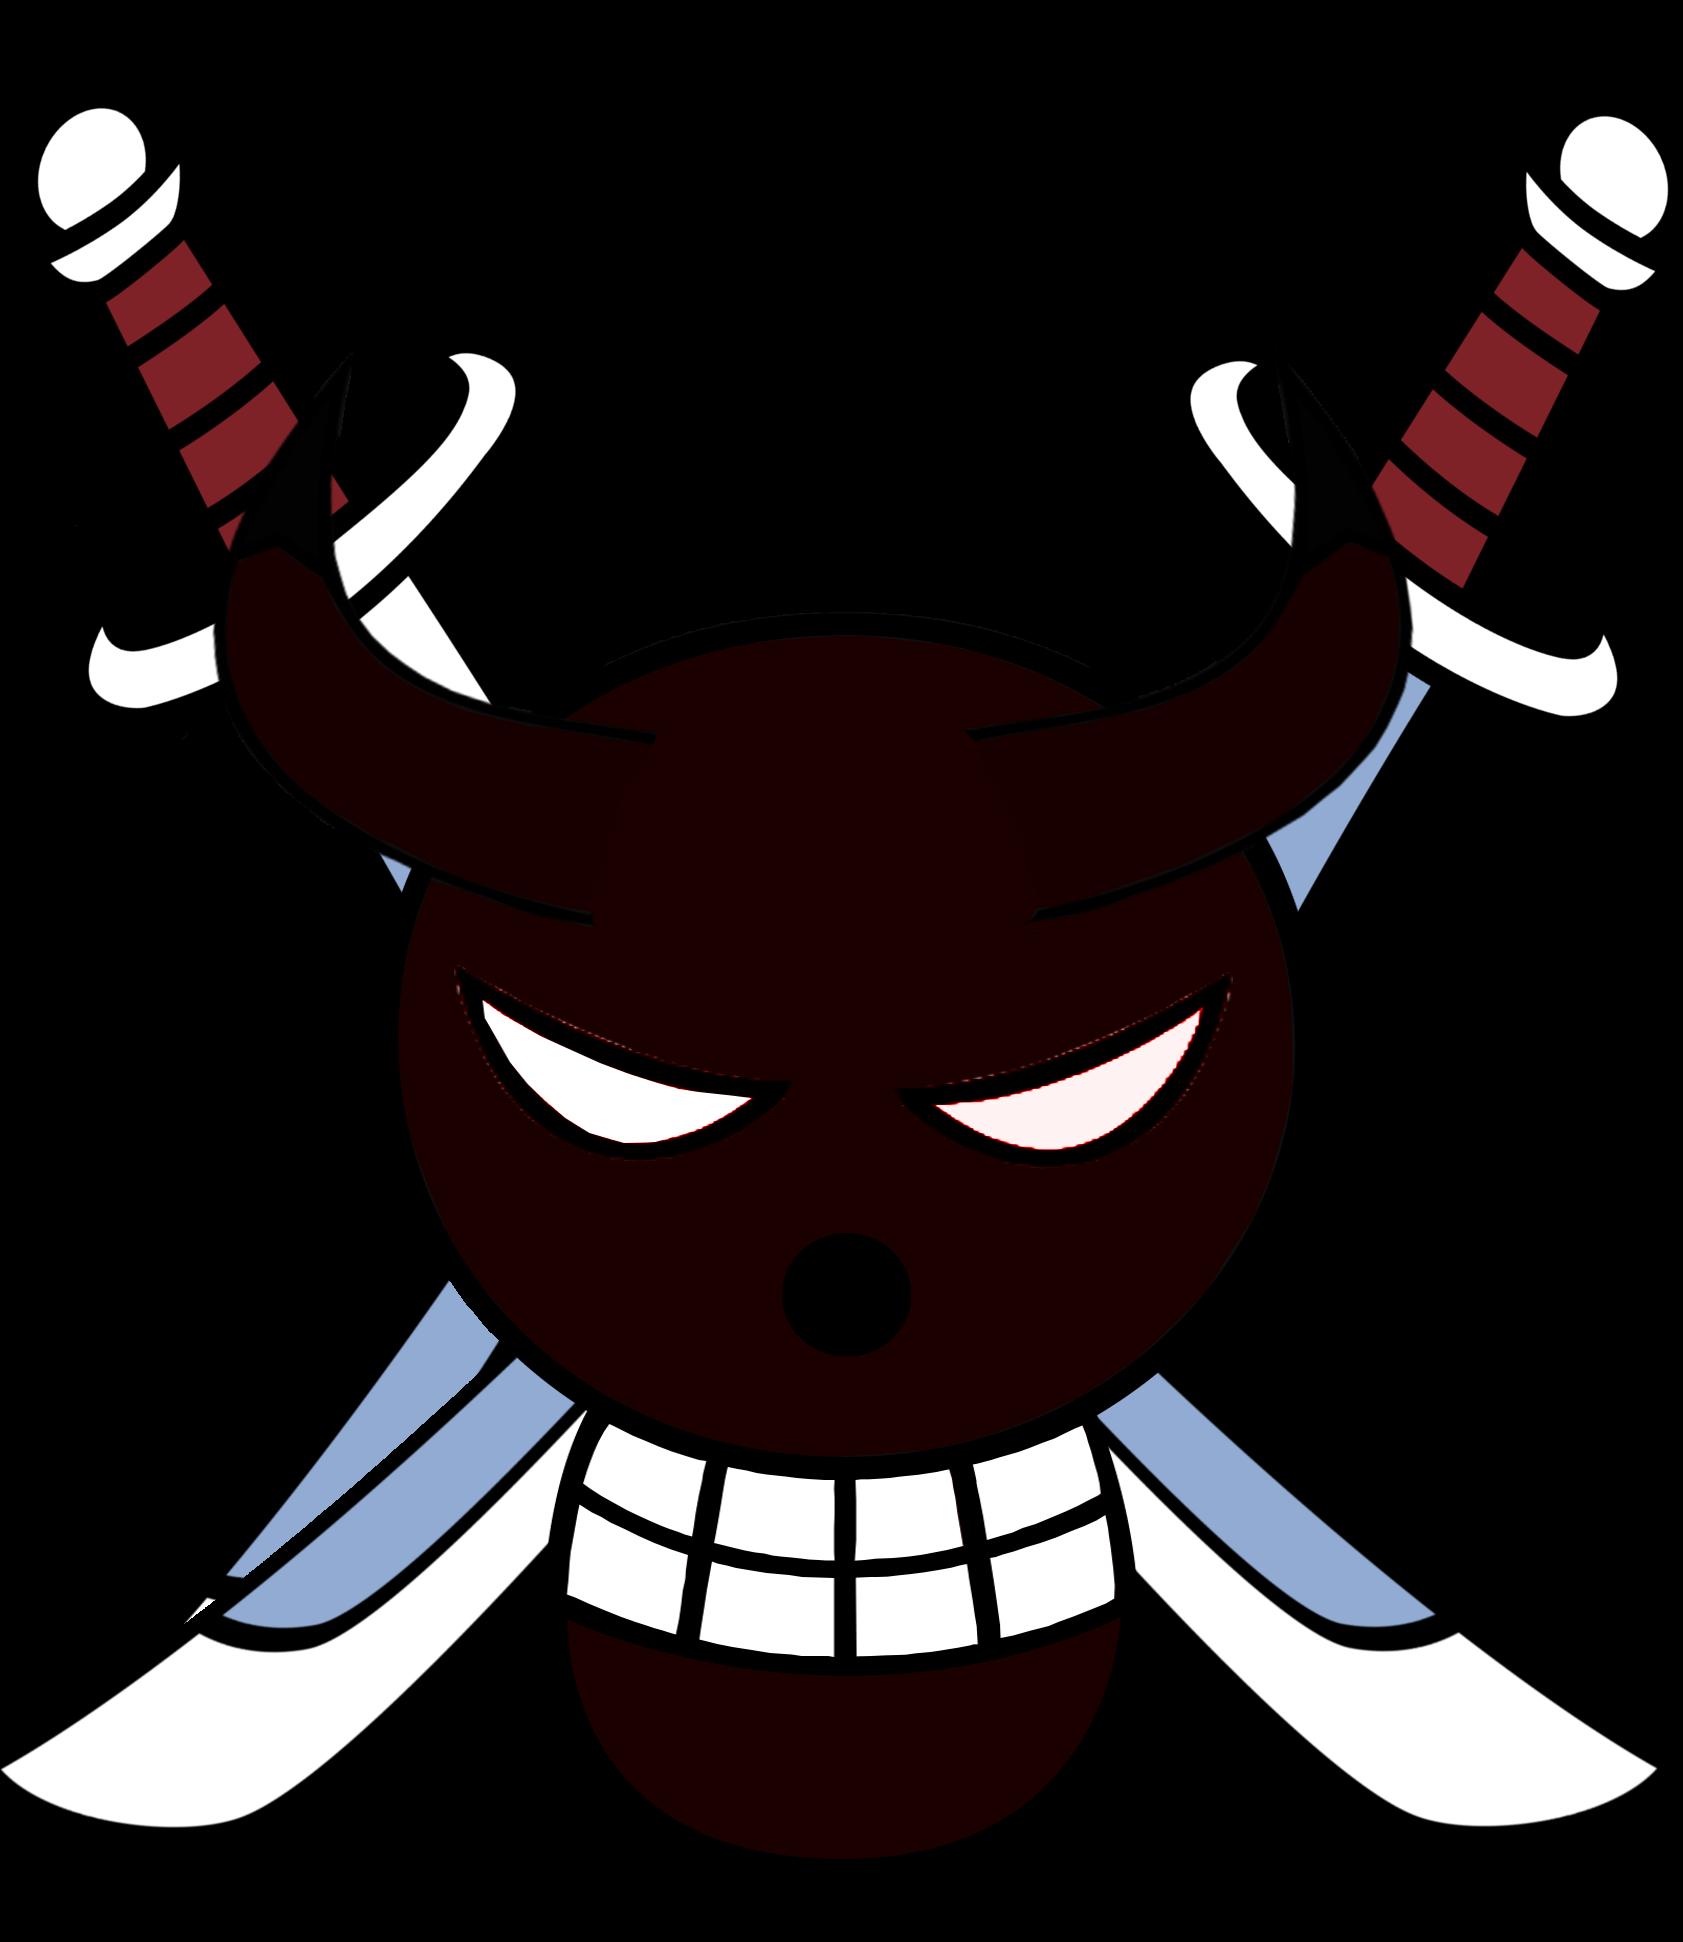 Pirates one piece ship. Devil clipart red devil